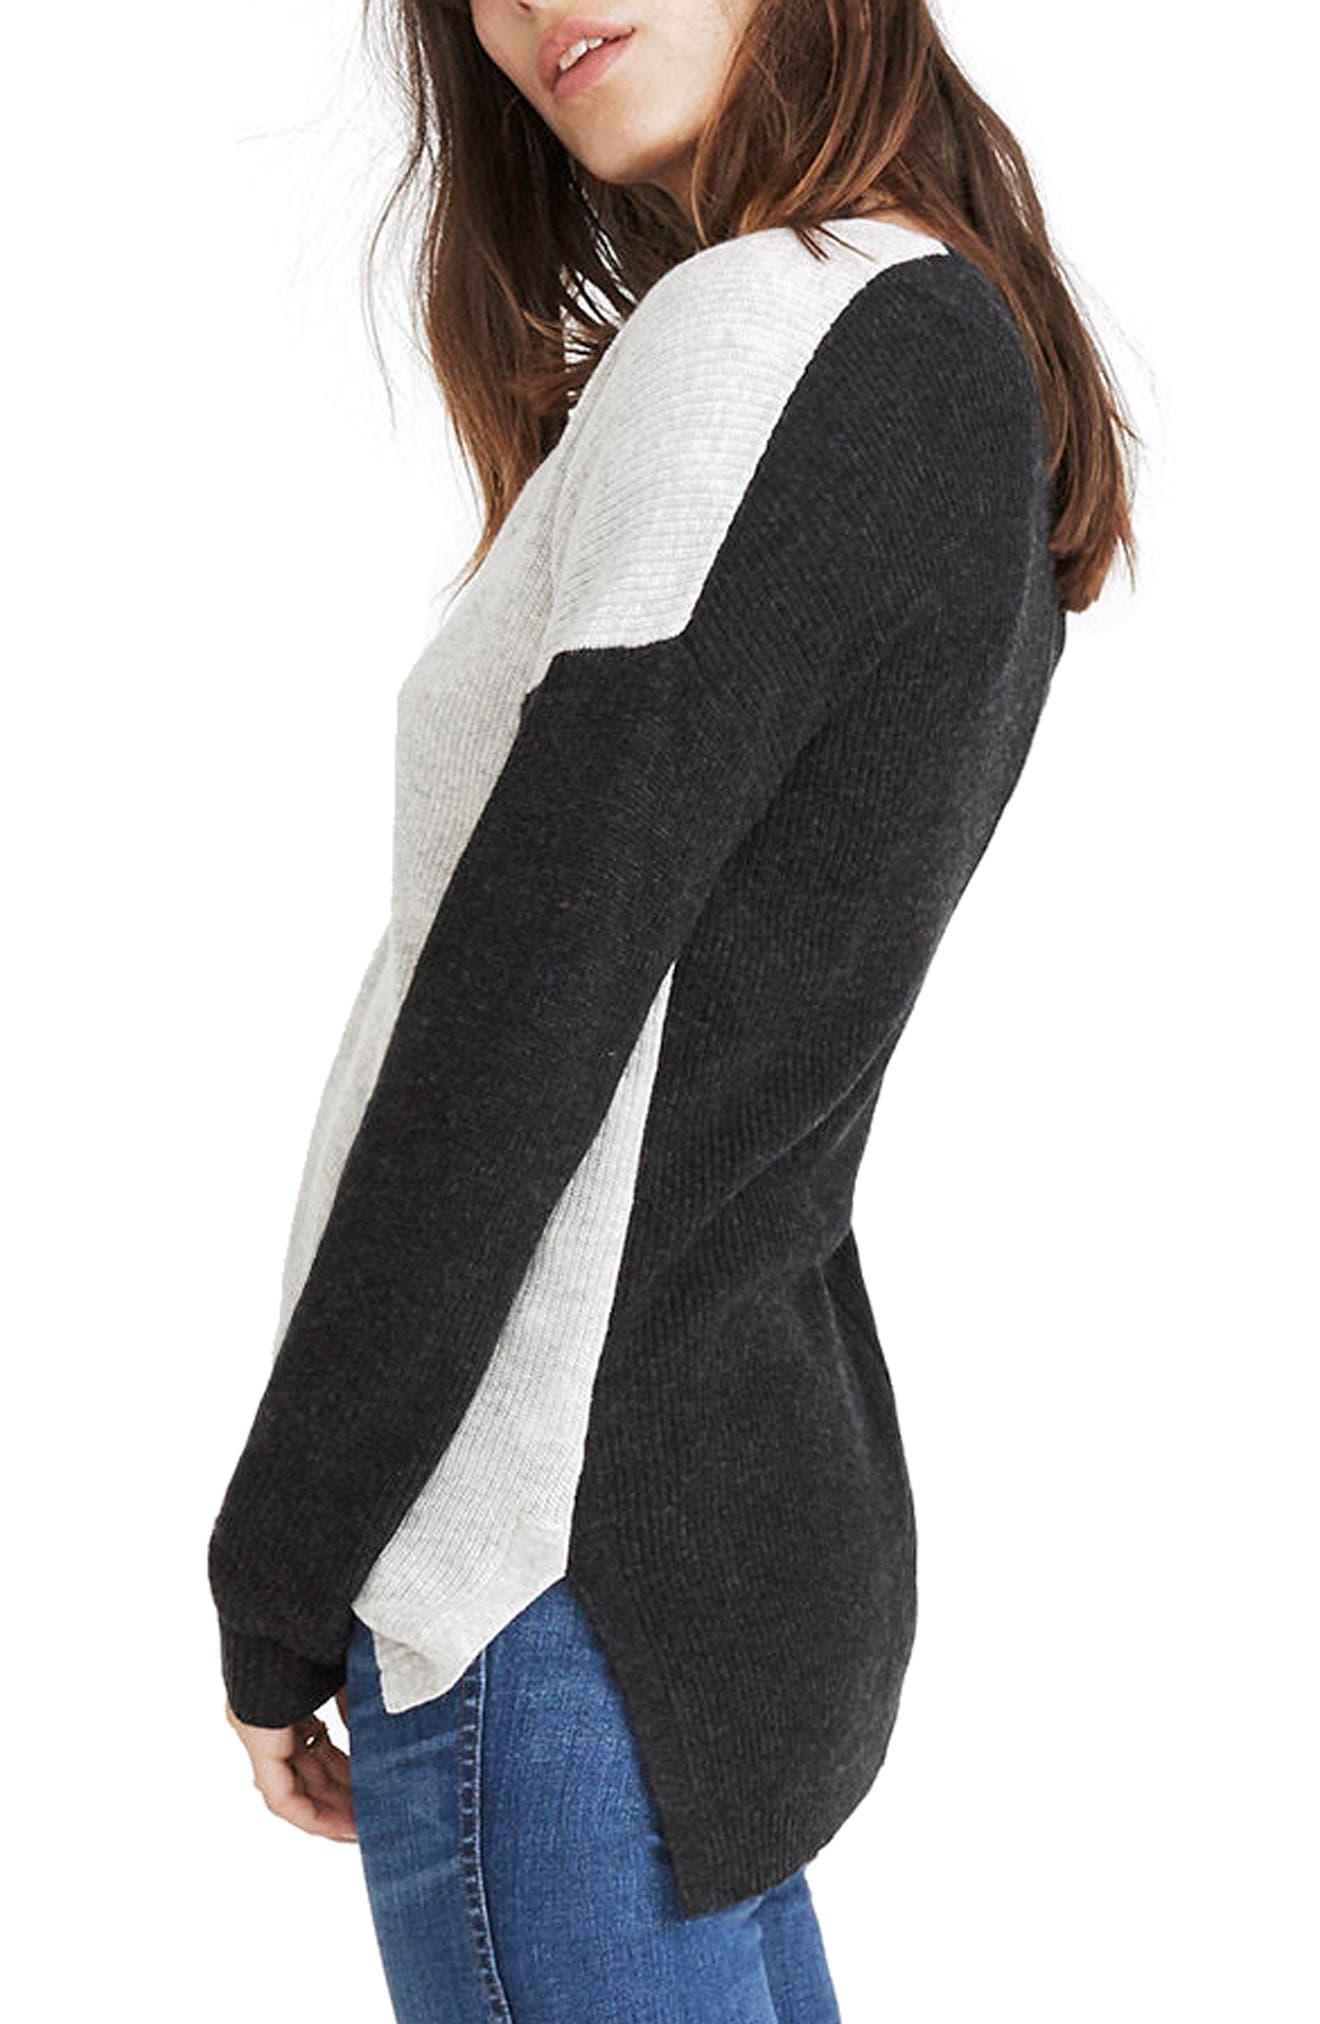 Warmlight Colorblock V-Neck Sweater,                             Alternate thumbnail 2, color,                             090